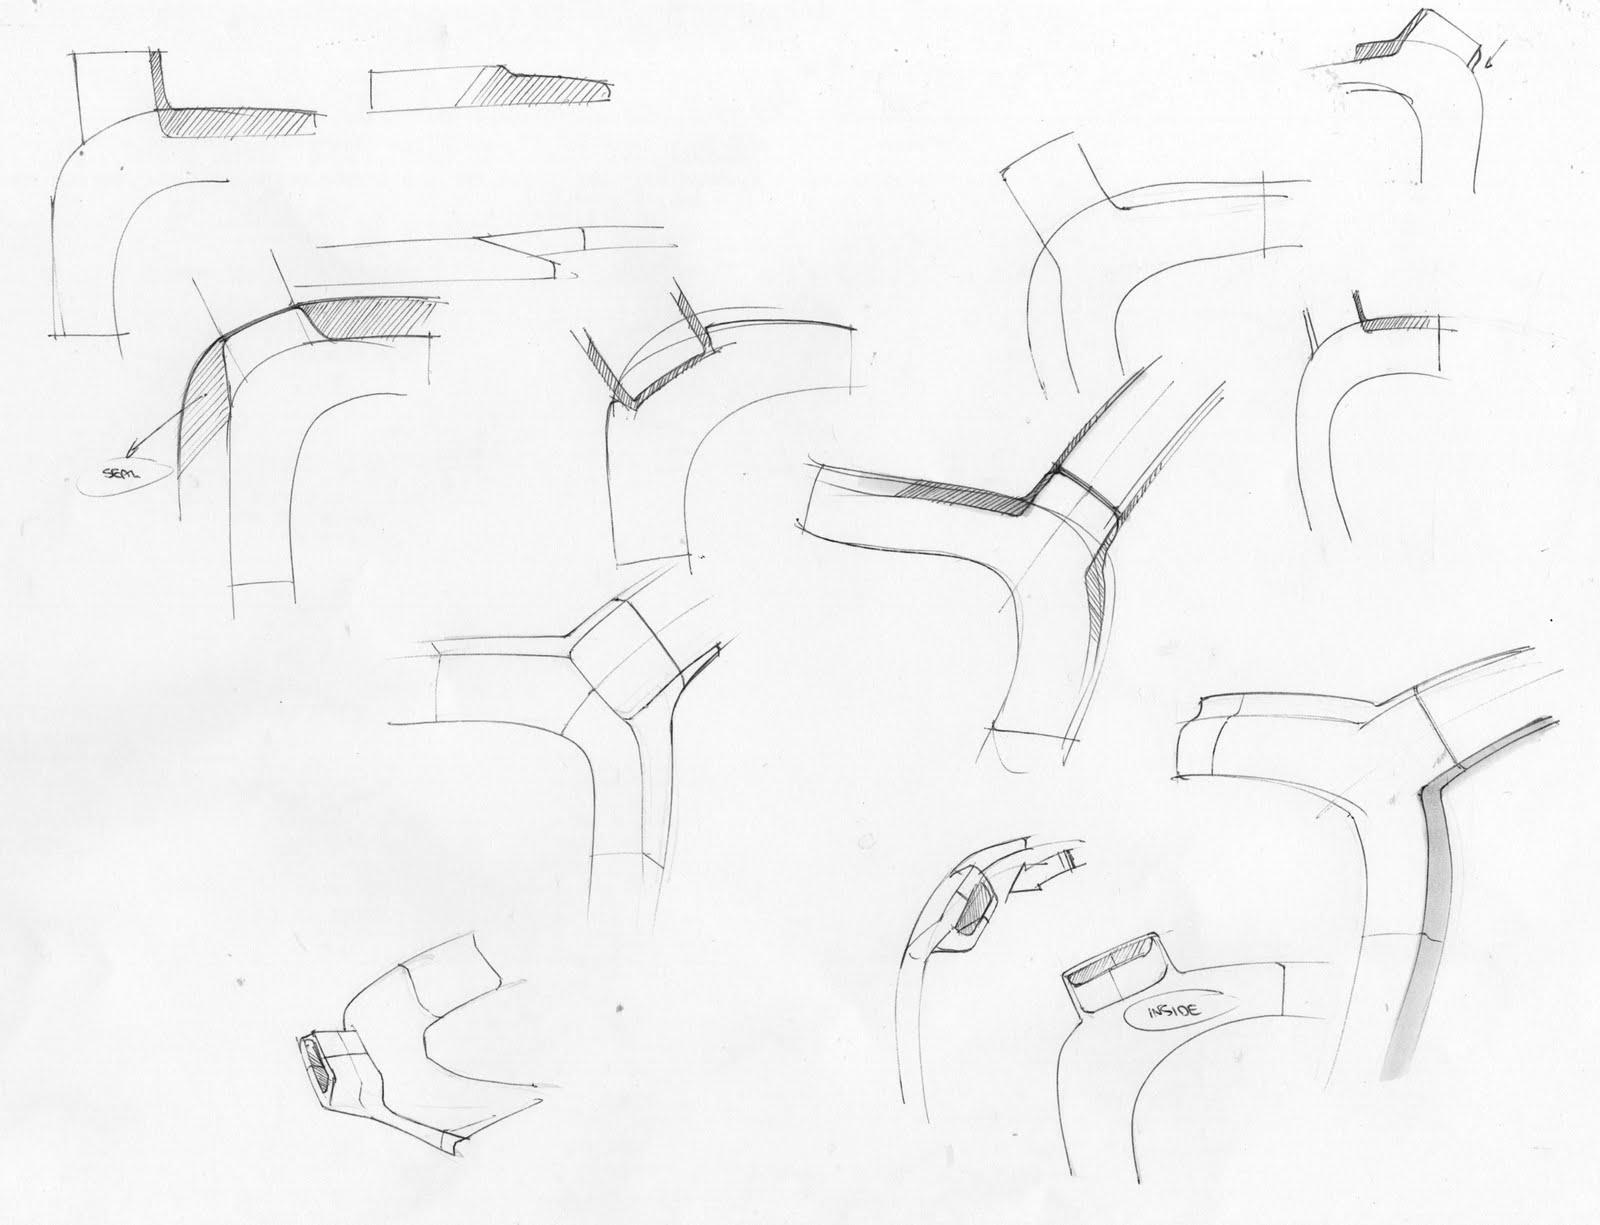 Bruce Walls Hyperbaric Mask Development Ideation Welding Diagram